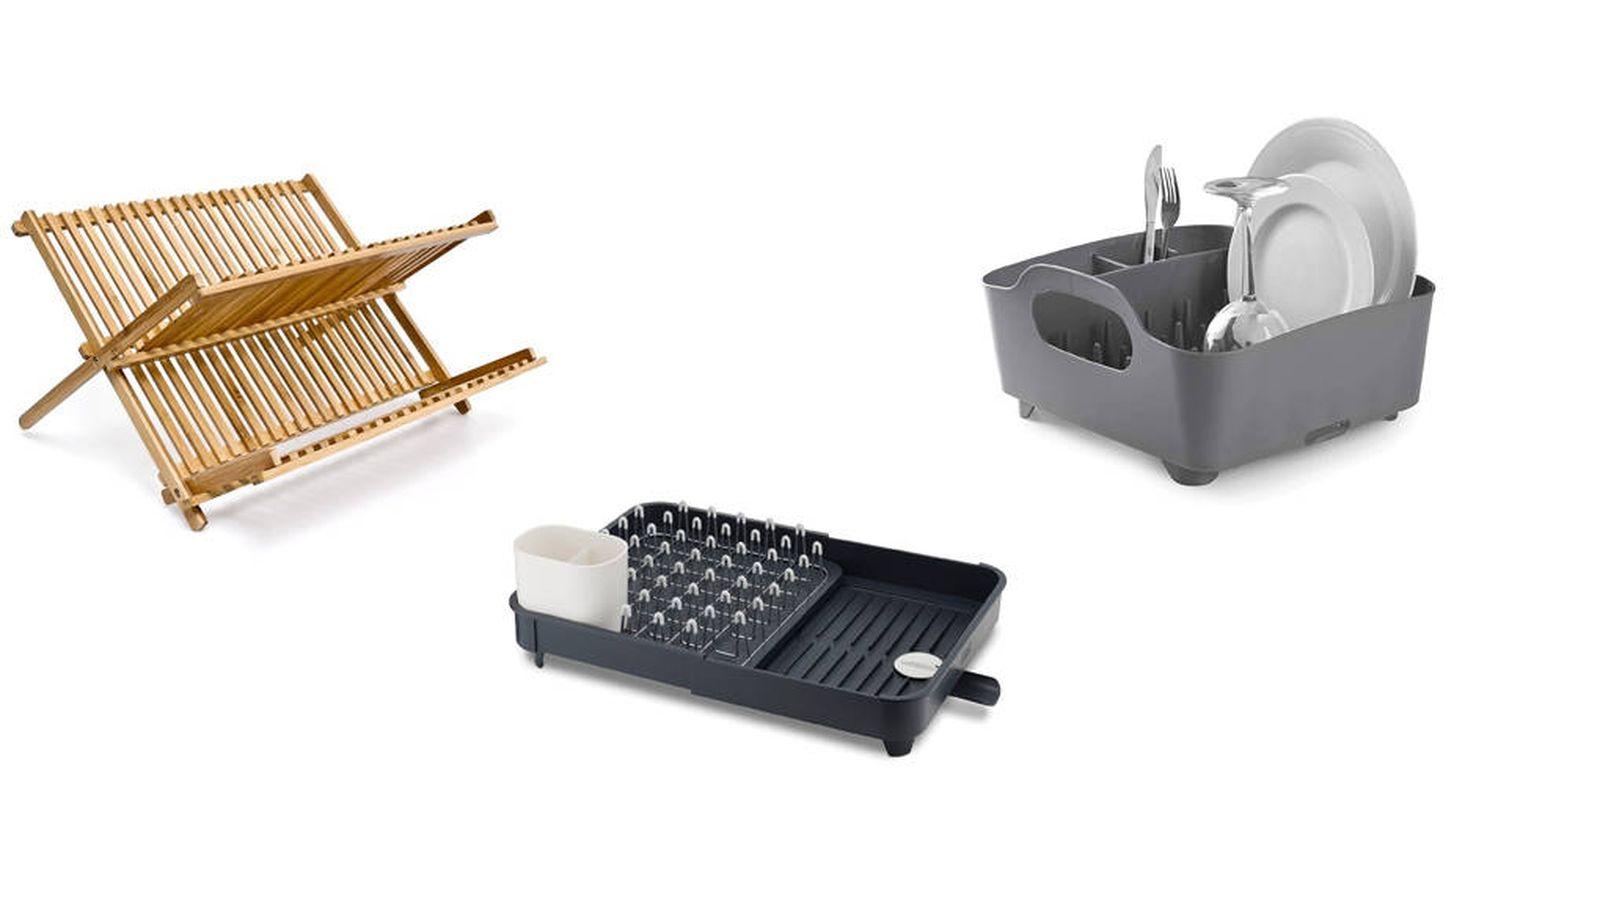 Escurridor de bamb/ú Accesorios de cocina Herramientas de limpieza Escurreplatos| Organizador de cubiertos de una pieza Escurridor de platos de madera M/&W